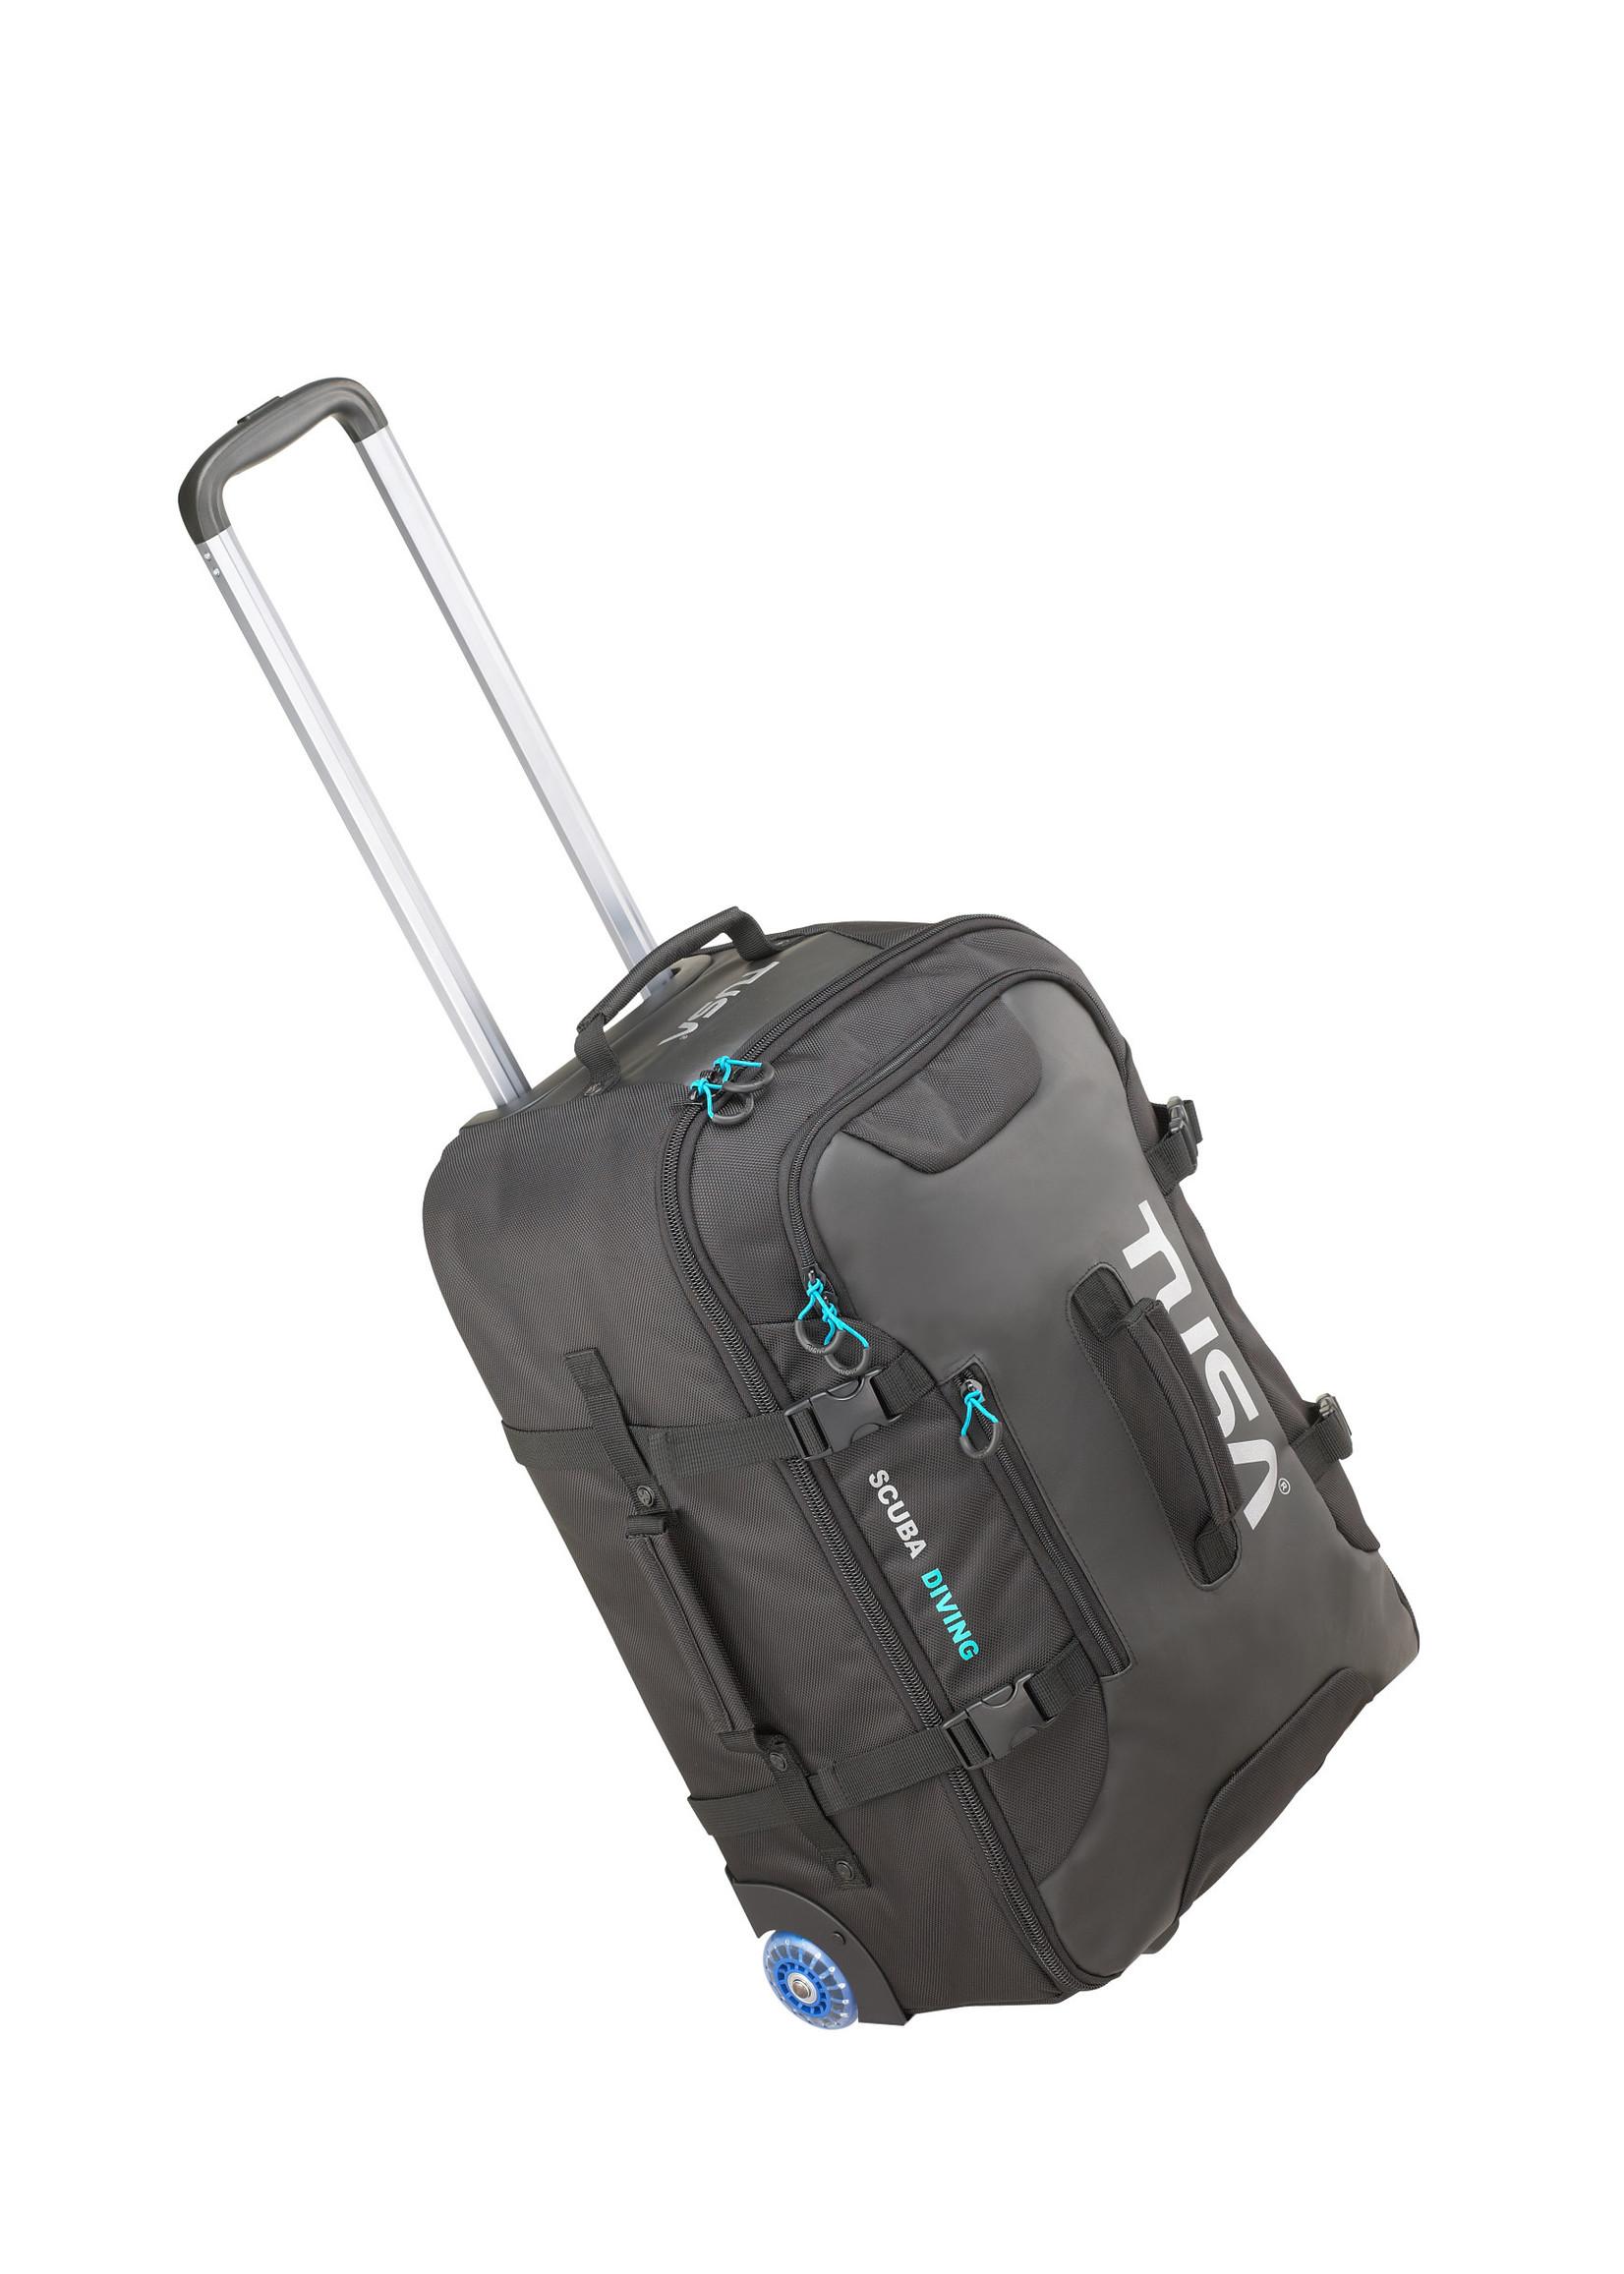 TUSA TUSA Roller Bag 47L